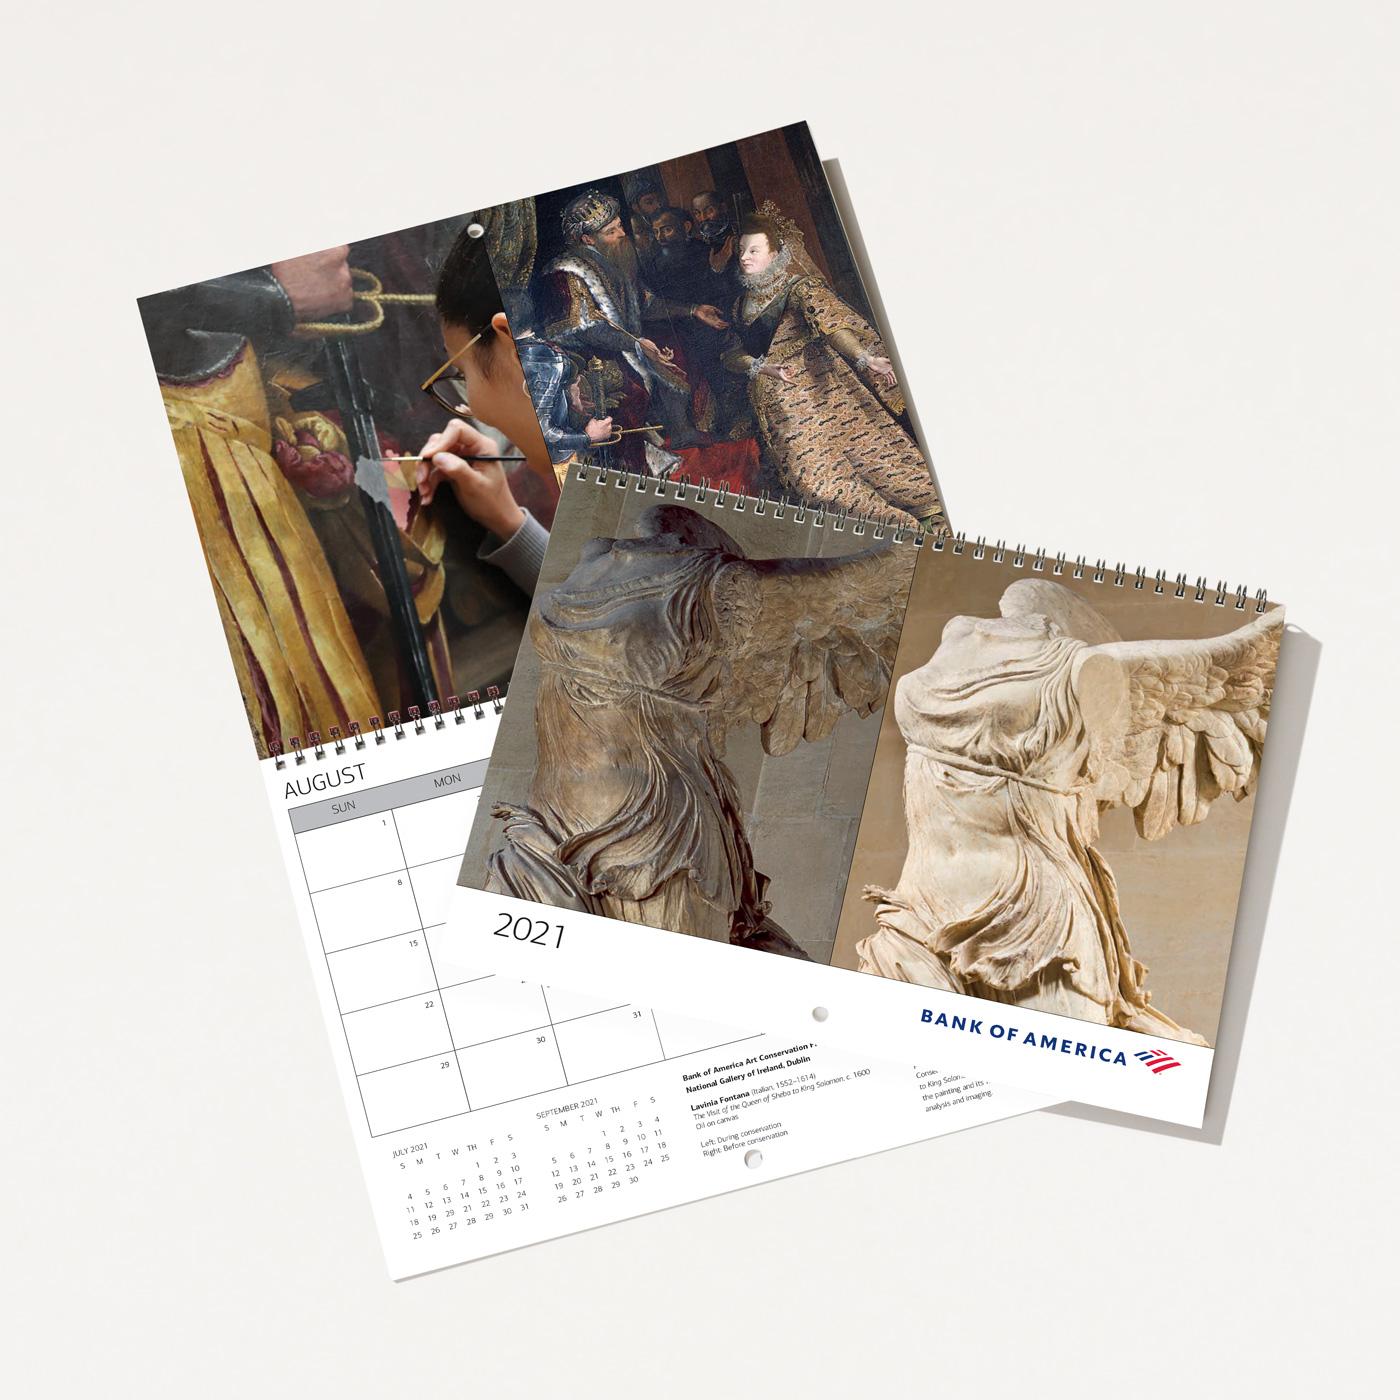 Bank of America 2021 Wall Calendar | Bank of America Store